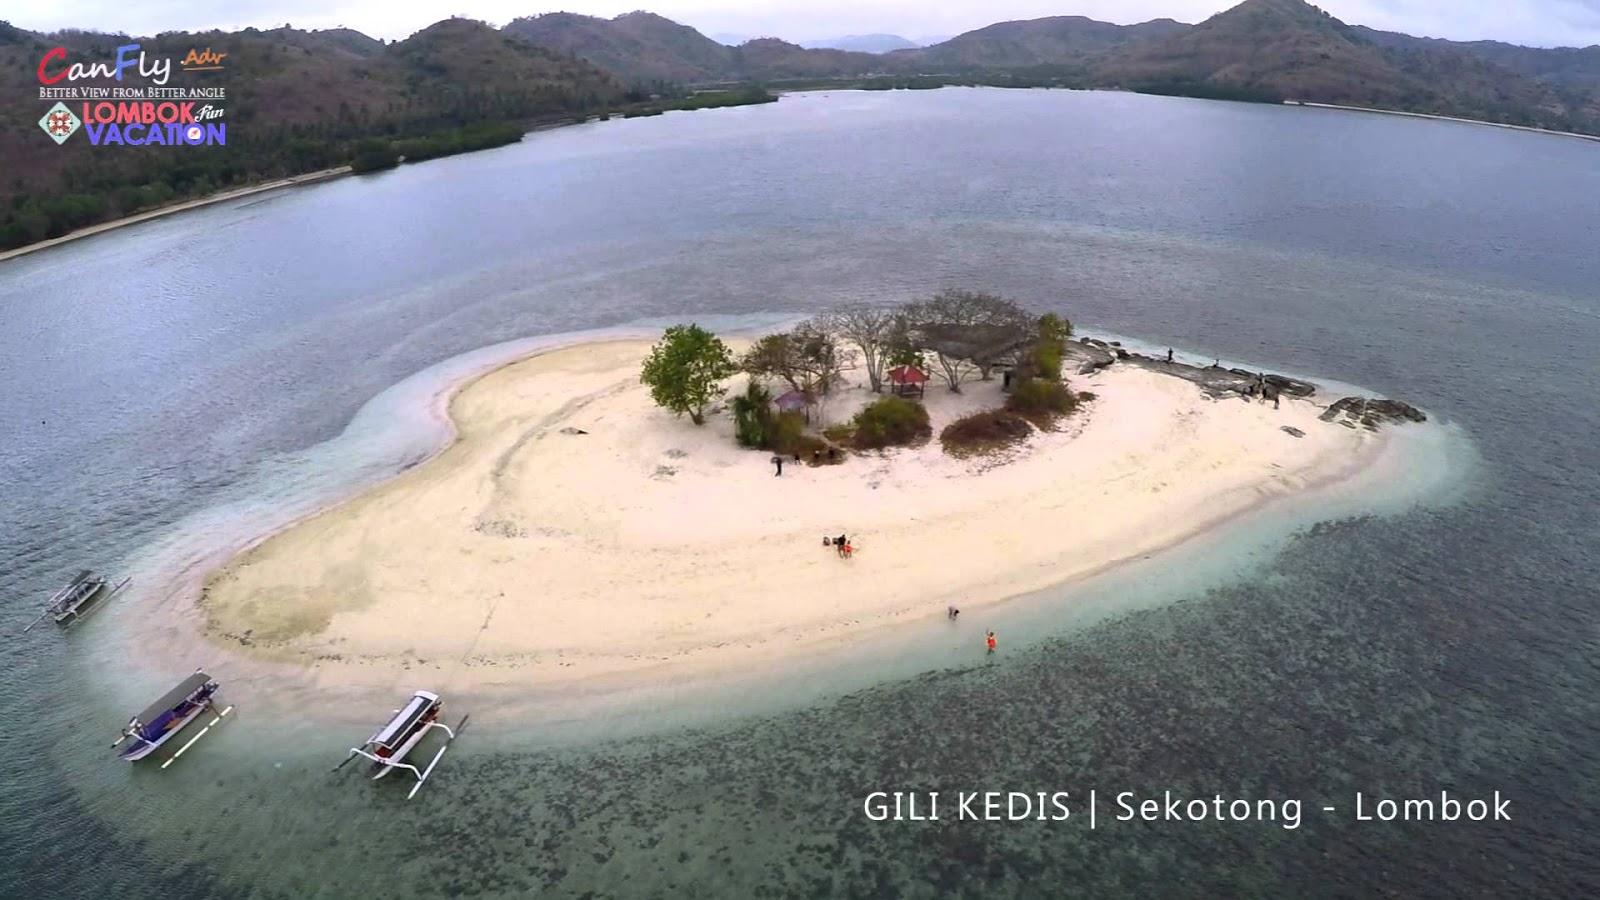 Bray 7 Tempat Wisata Lombok Nge Trend Gili Kedis Sekotong